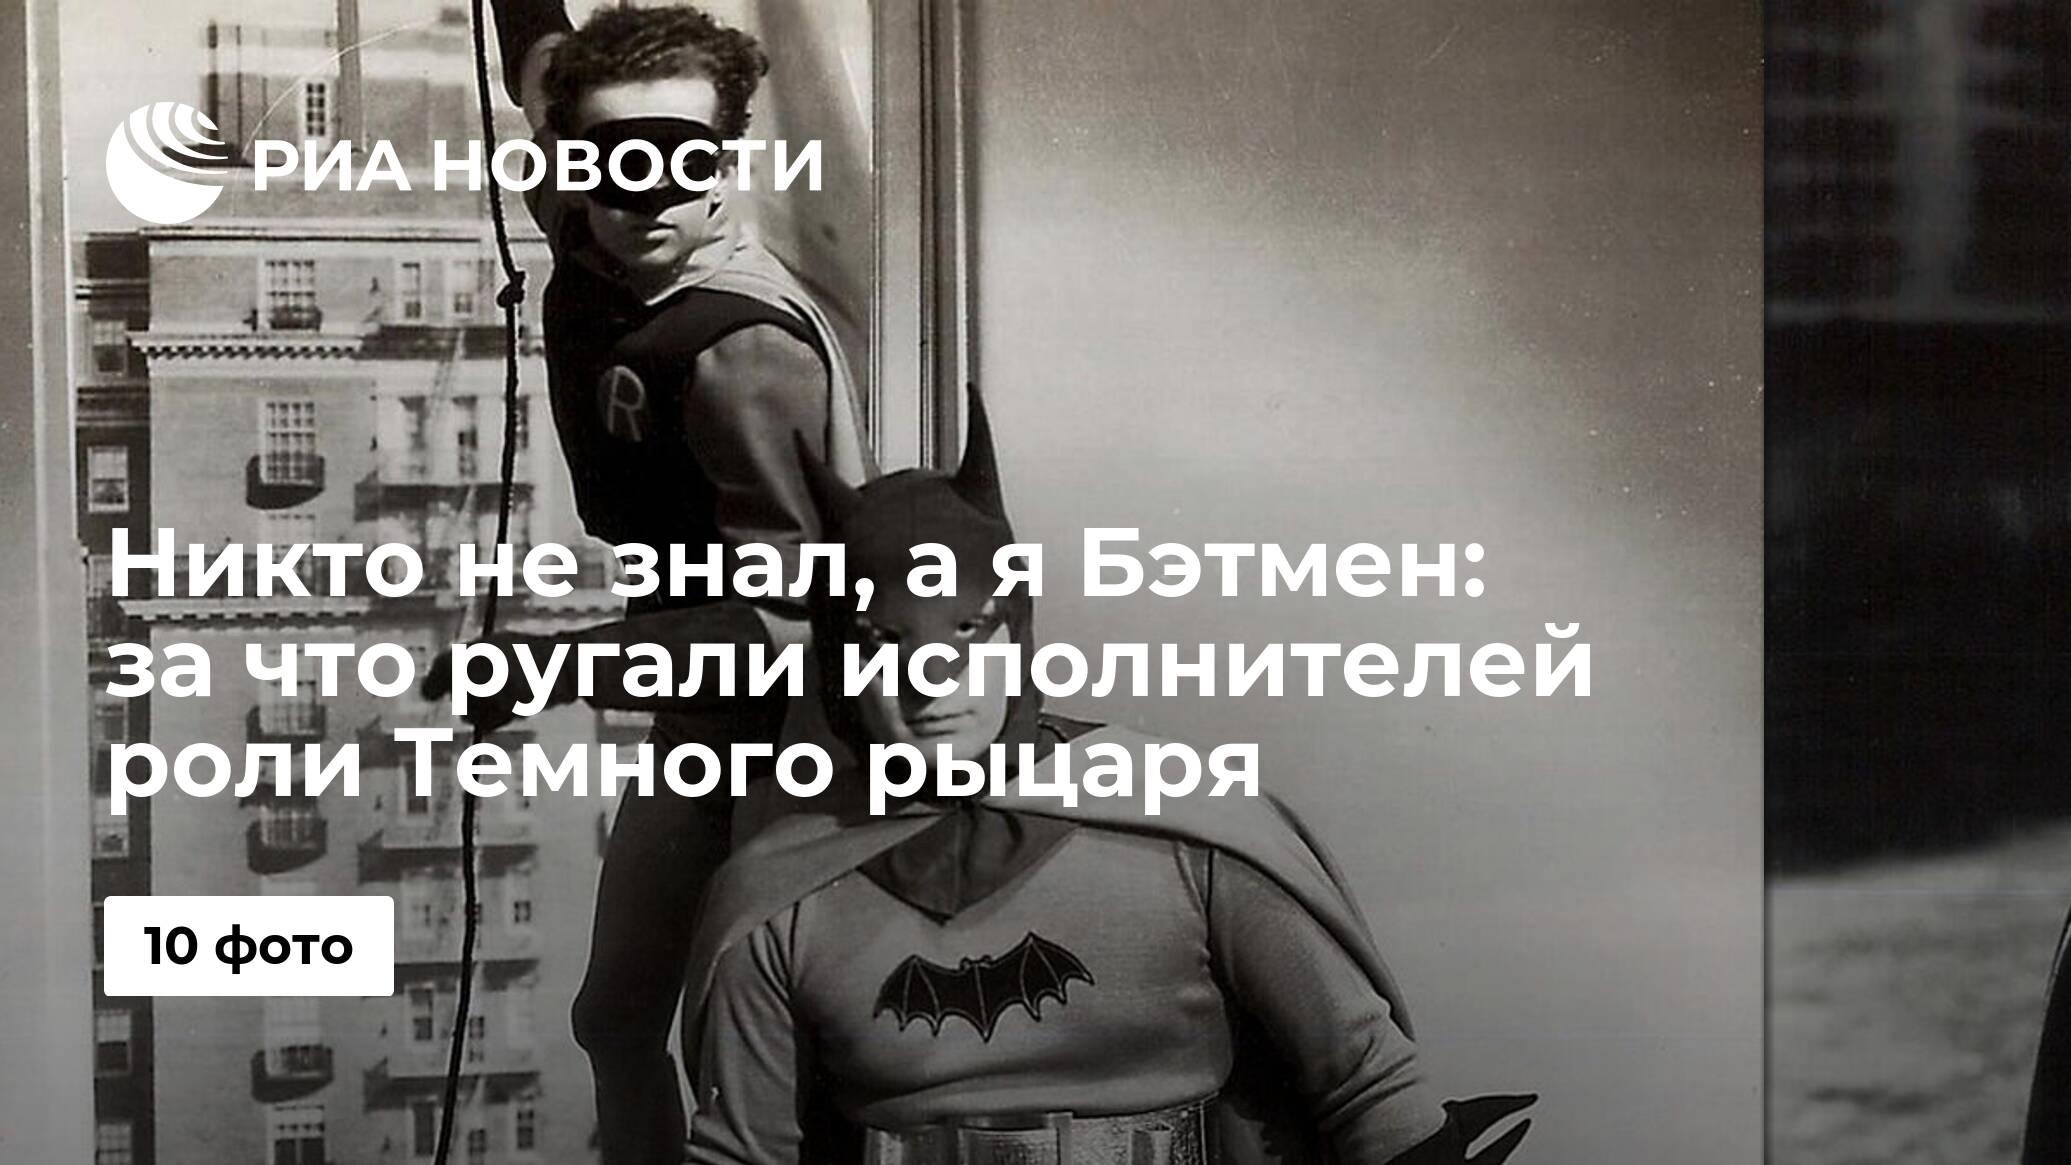 Никто не знал, а я Бэтмен: за что ругали исполнителей роли Темного рыцаря